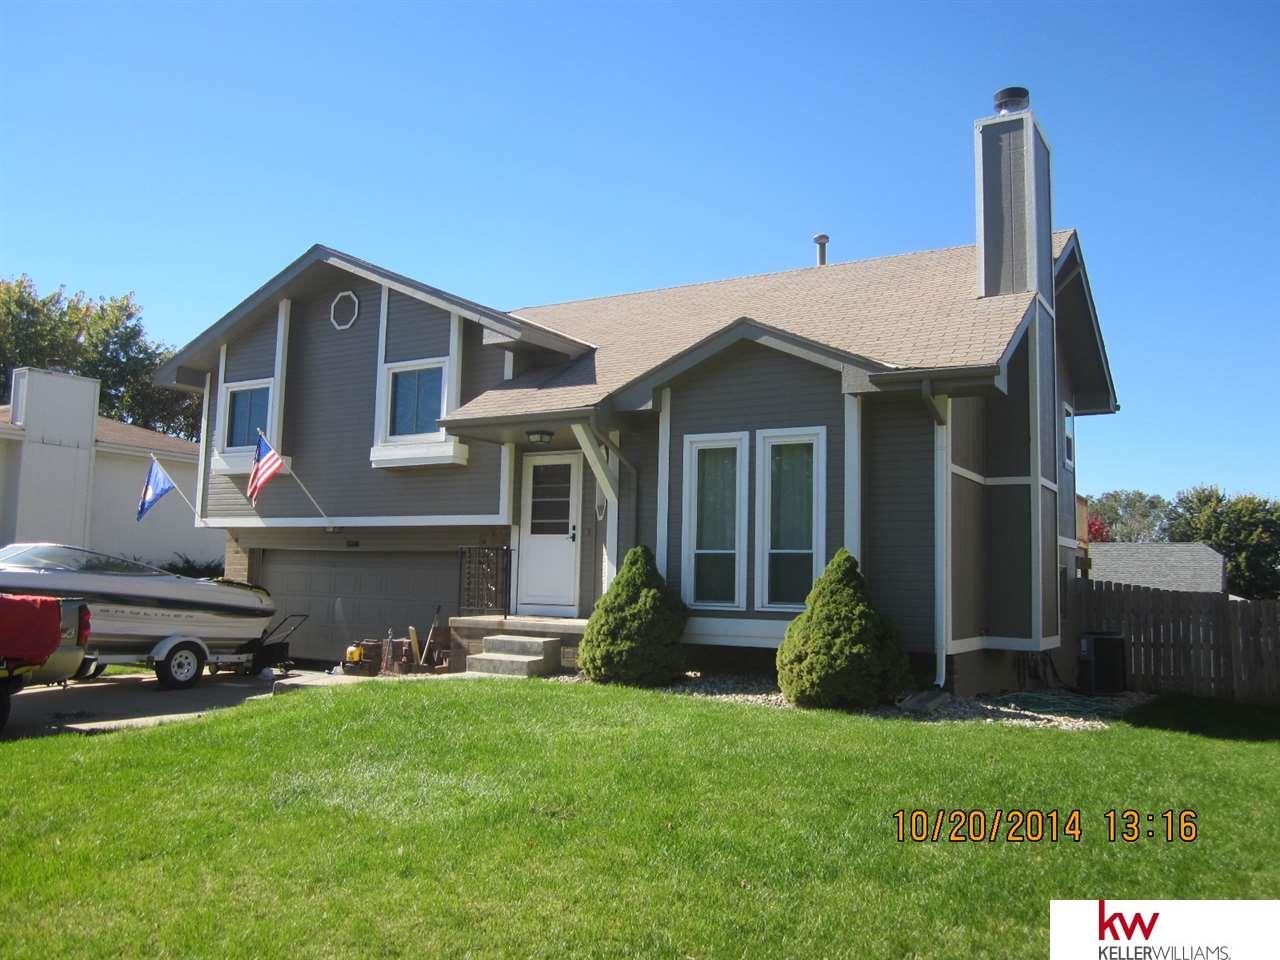 13308 S 34th St, Bellevue, NE 68123